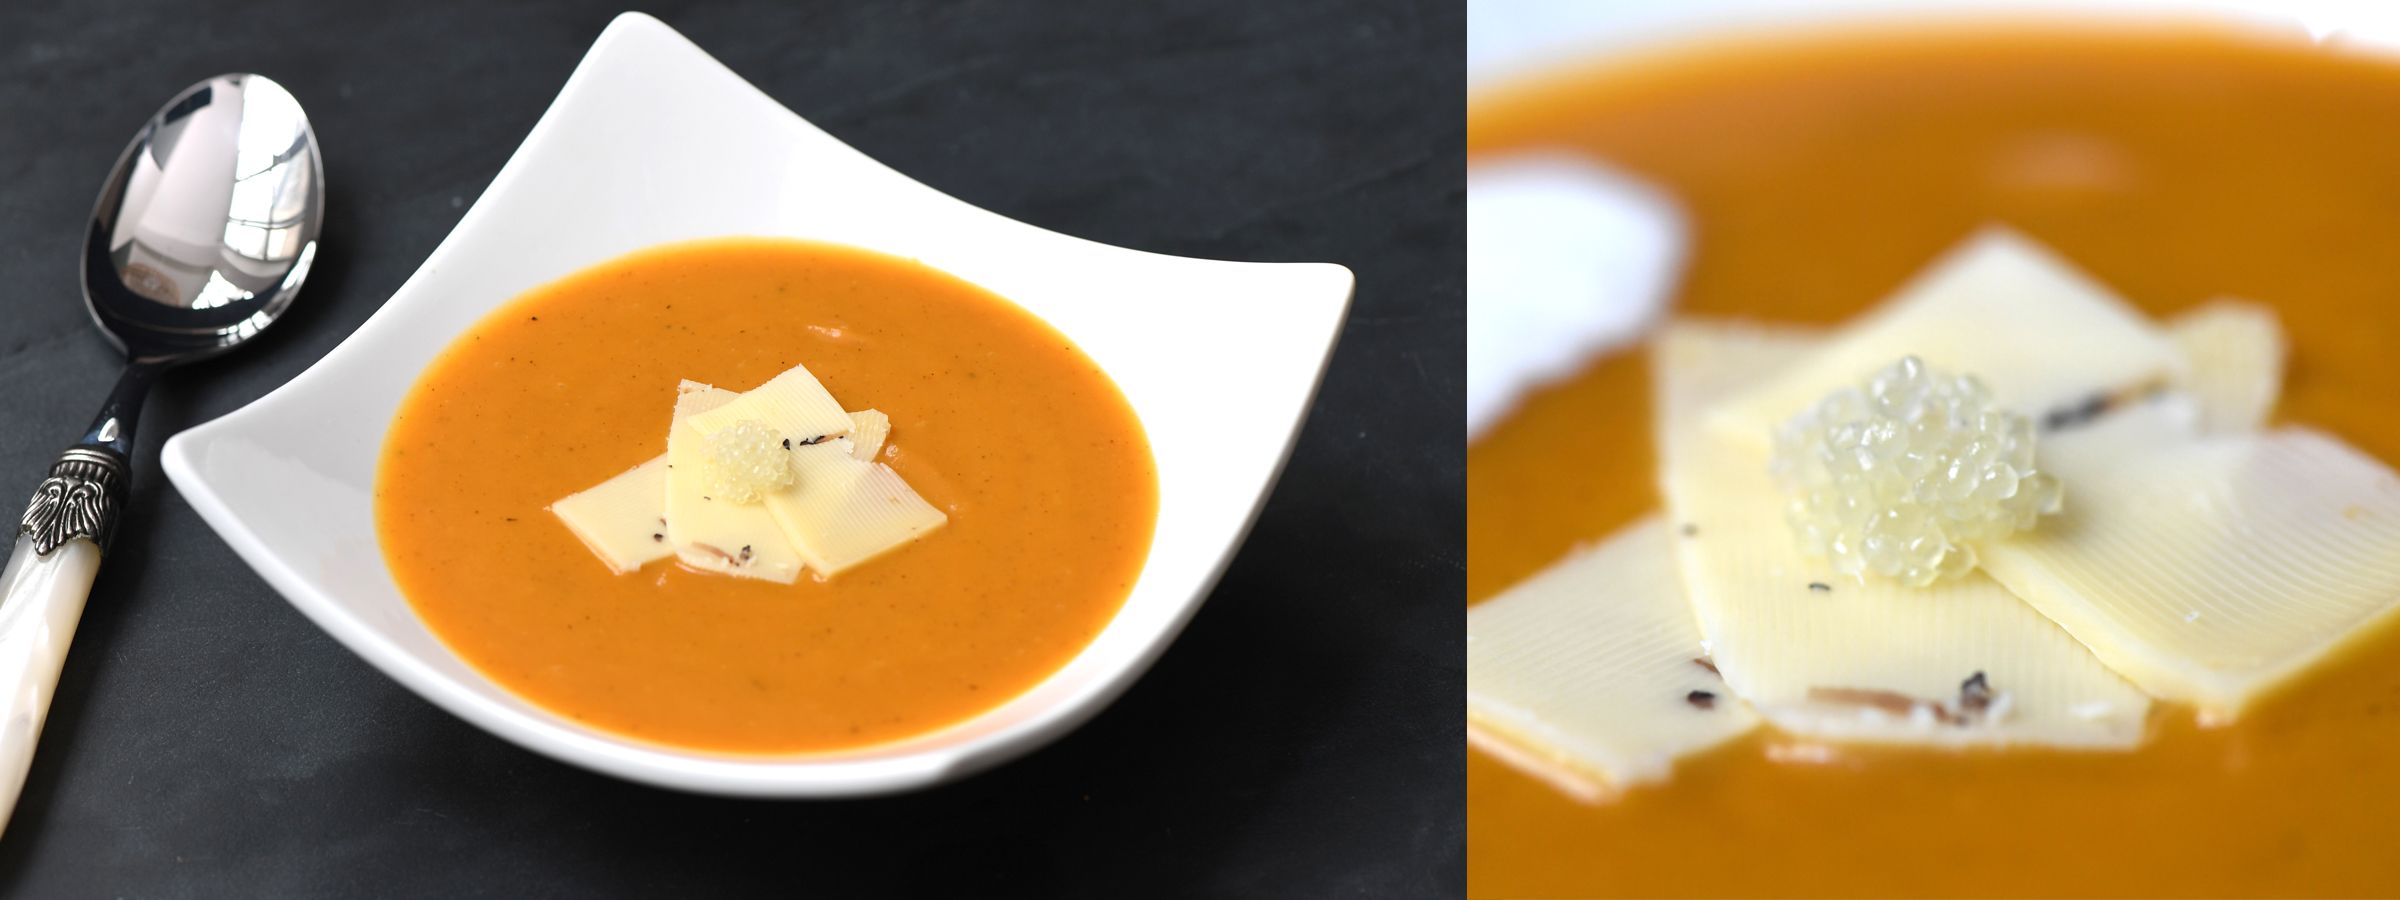 Veloute_de_Butternut_au_curry,_citron_caviar_sur_copeau_de_gouda_truffe_moncitroncavir.com_fruitsathome_02